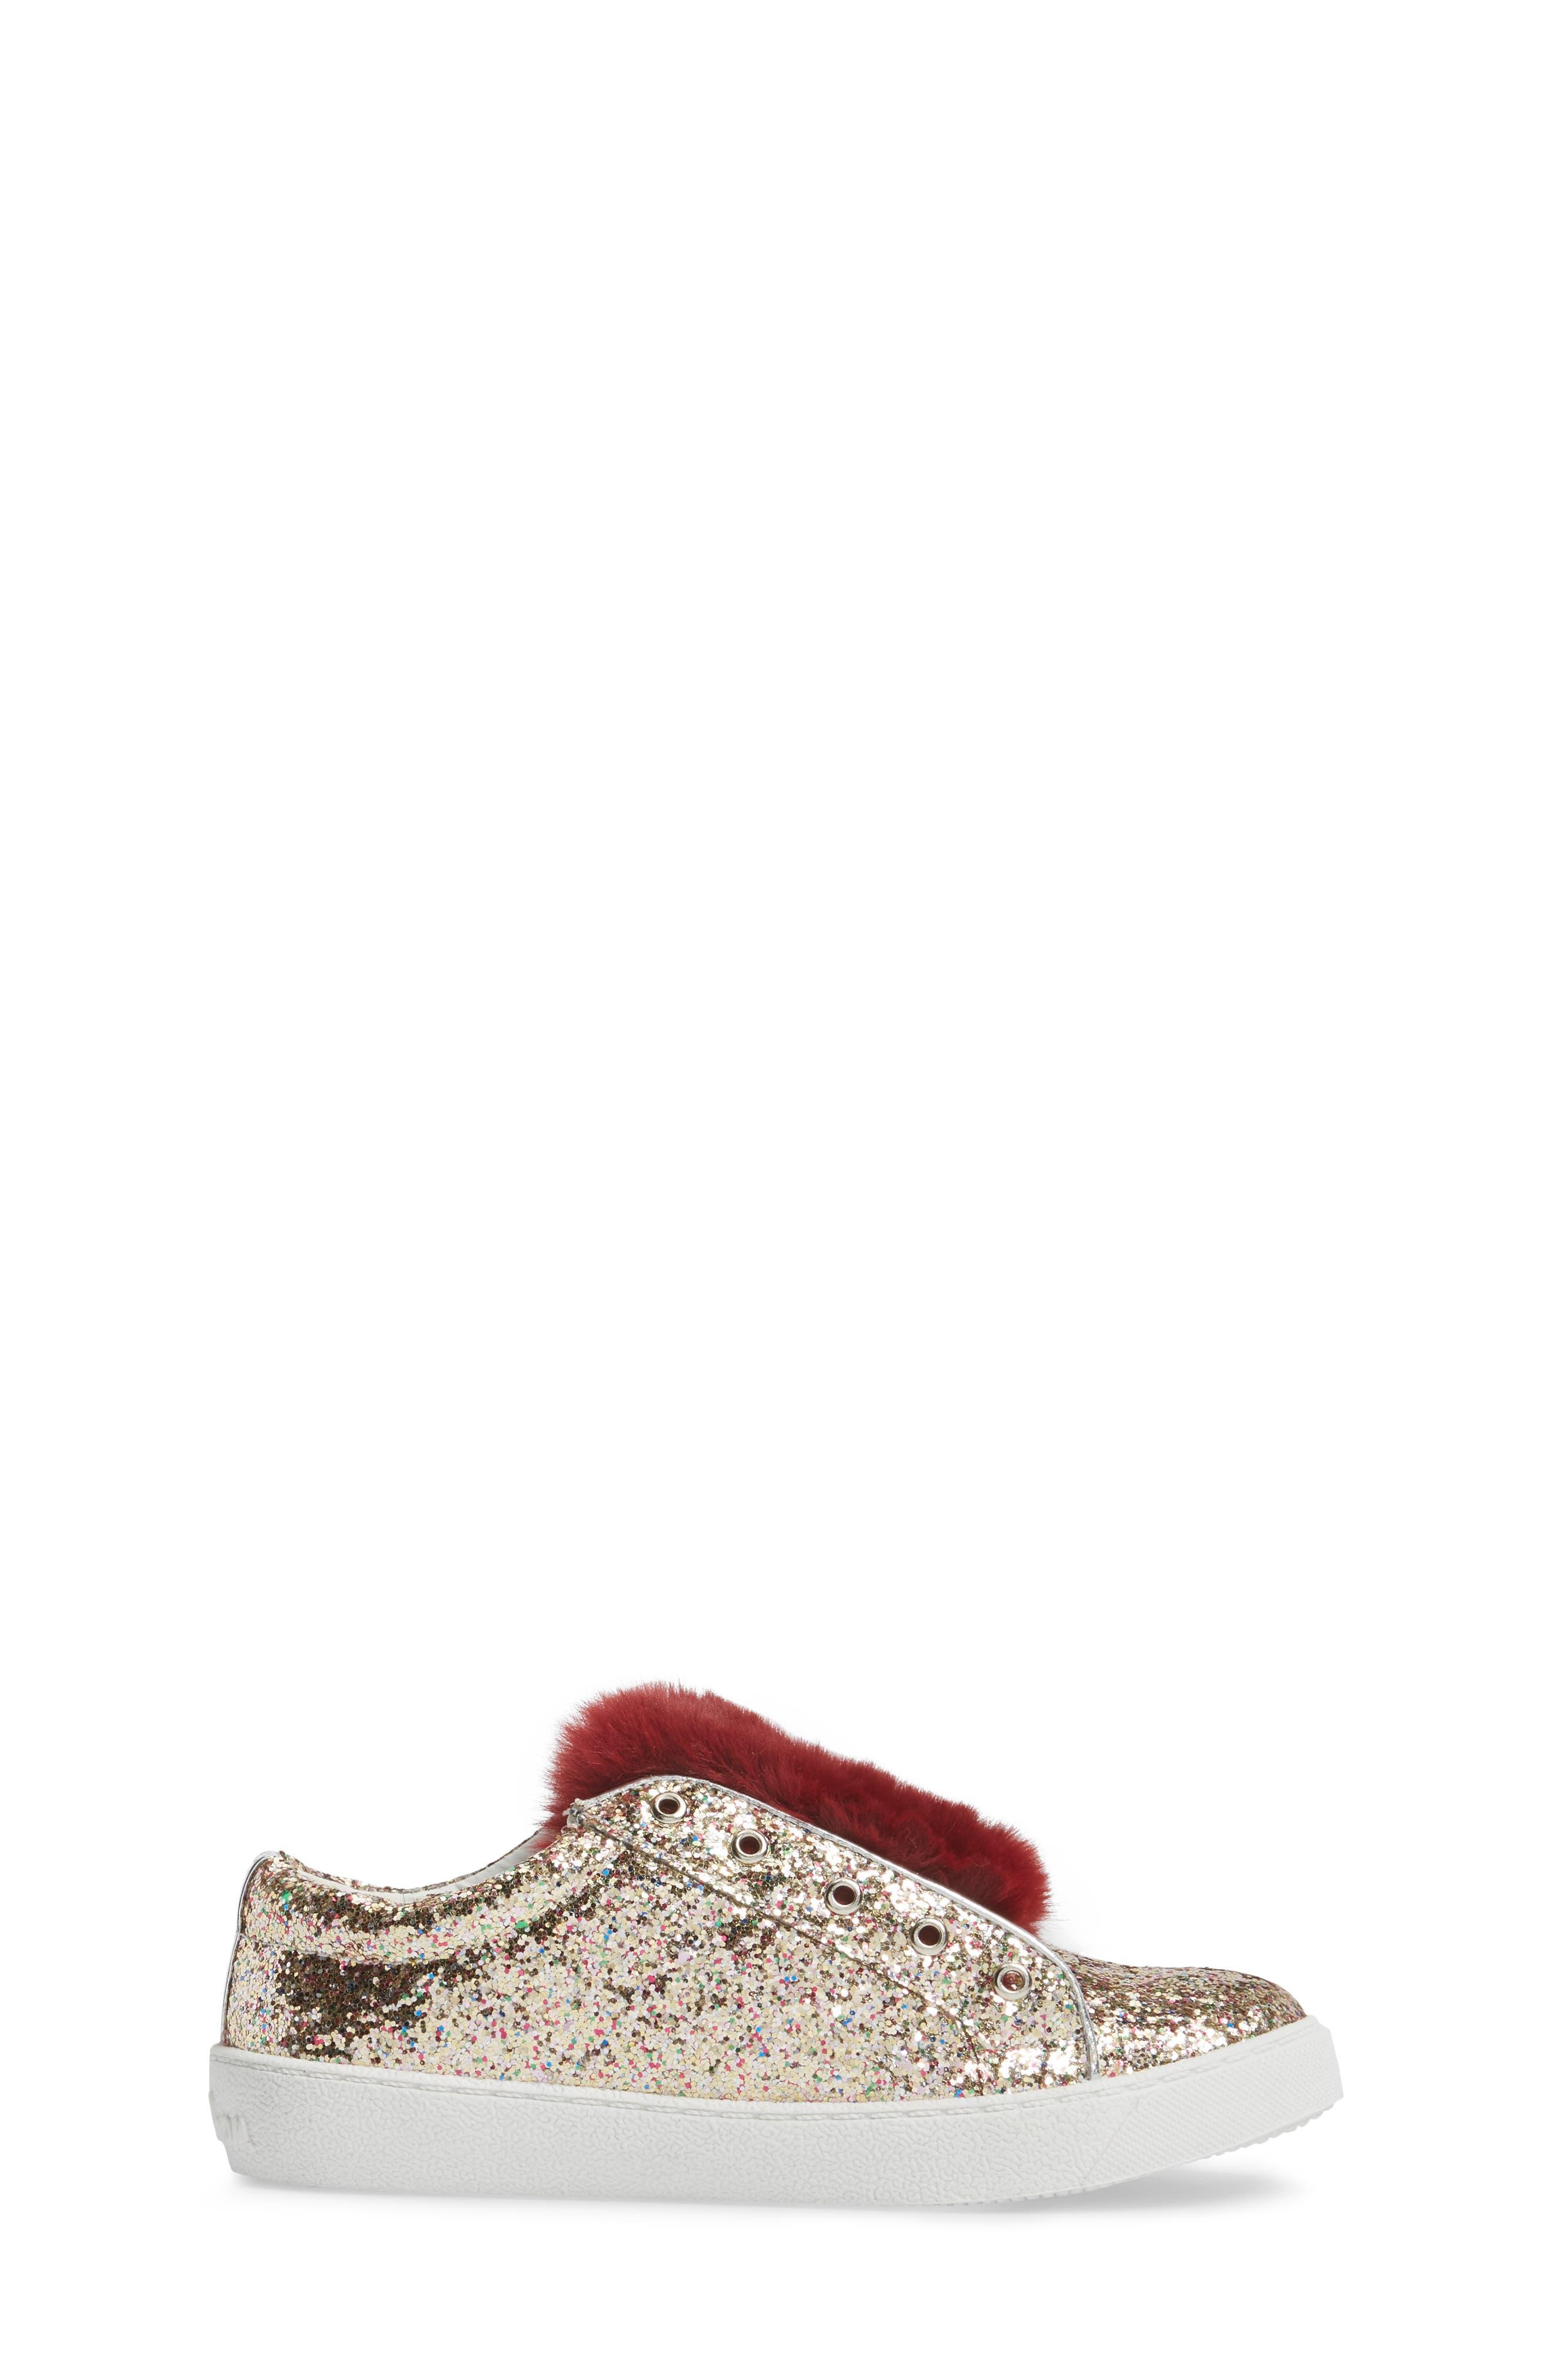 Alternate Image 3  - Sam Edelman Britt Rita Faux Fur Glitter Sneaker (Toddler, Little Kid & Big Kid)